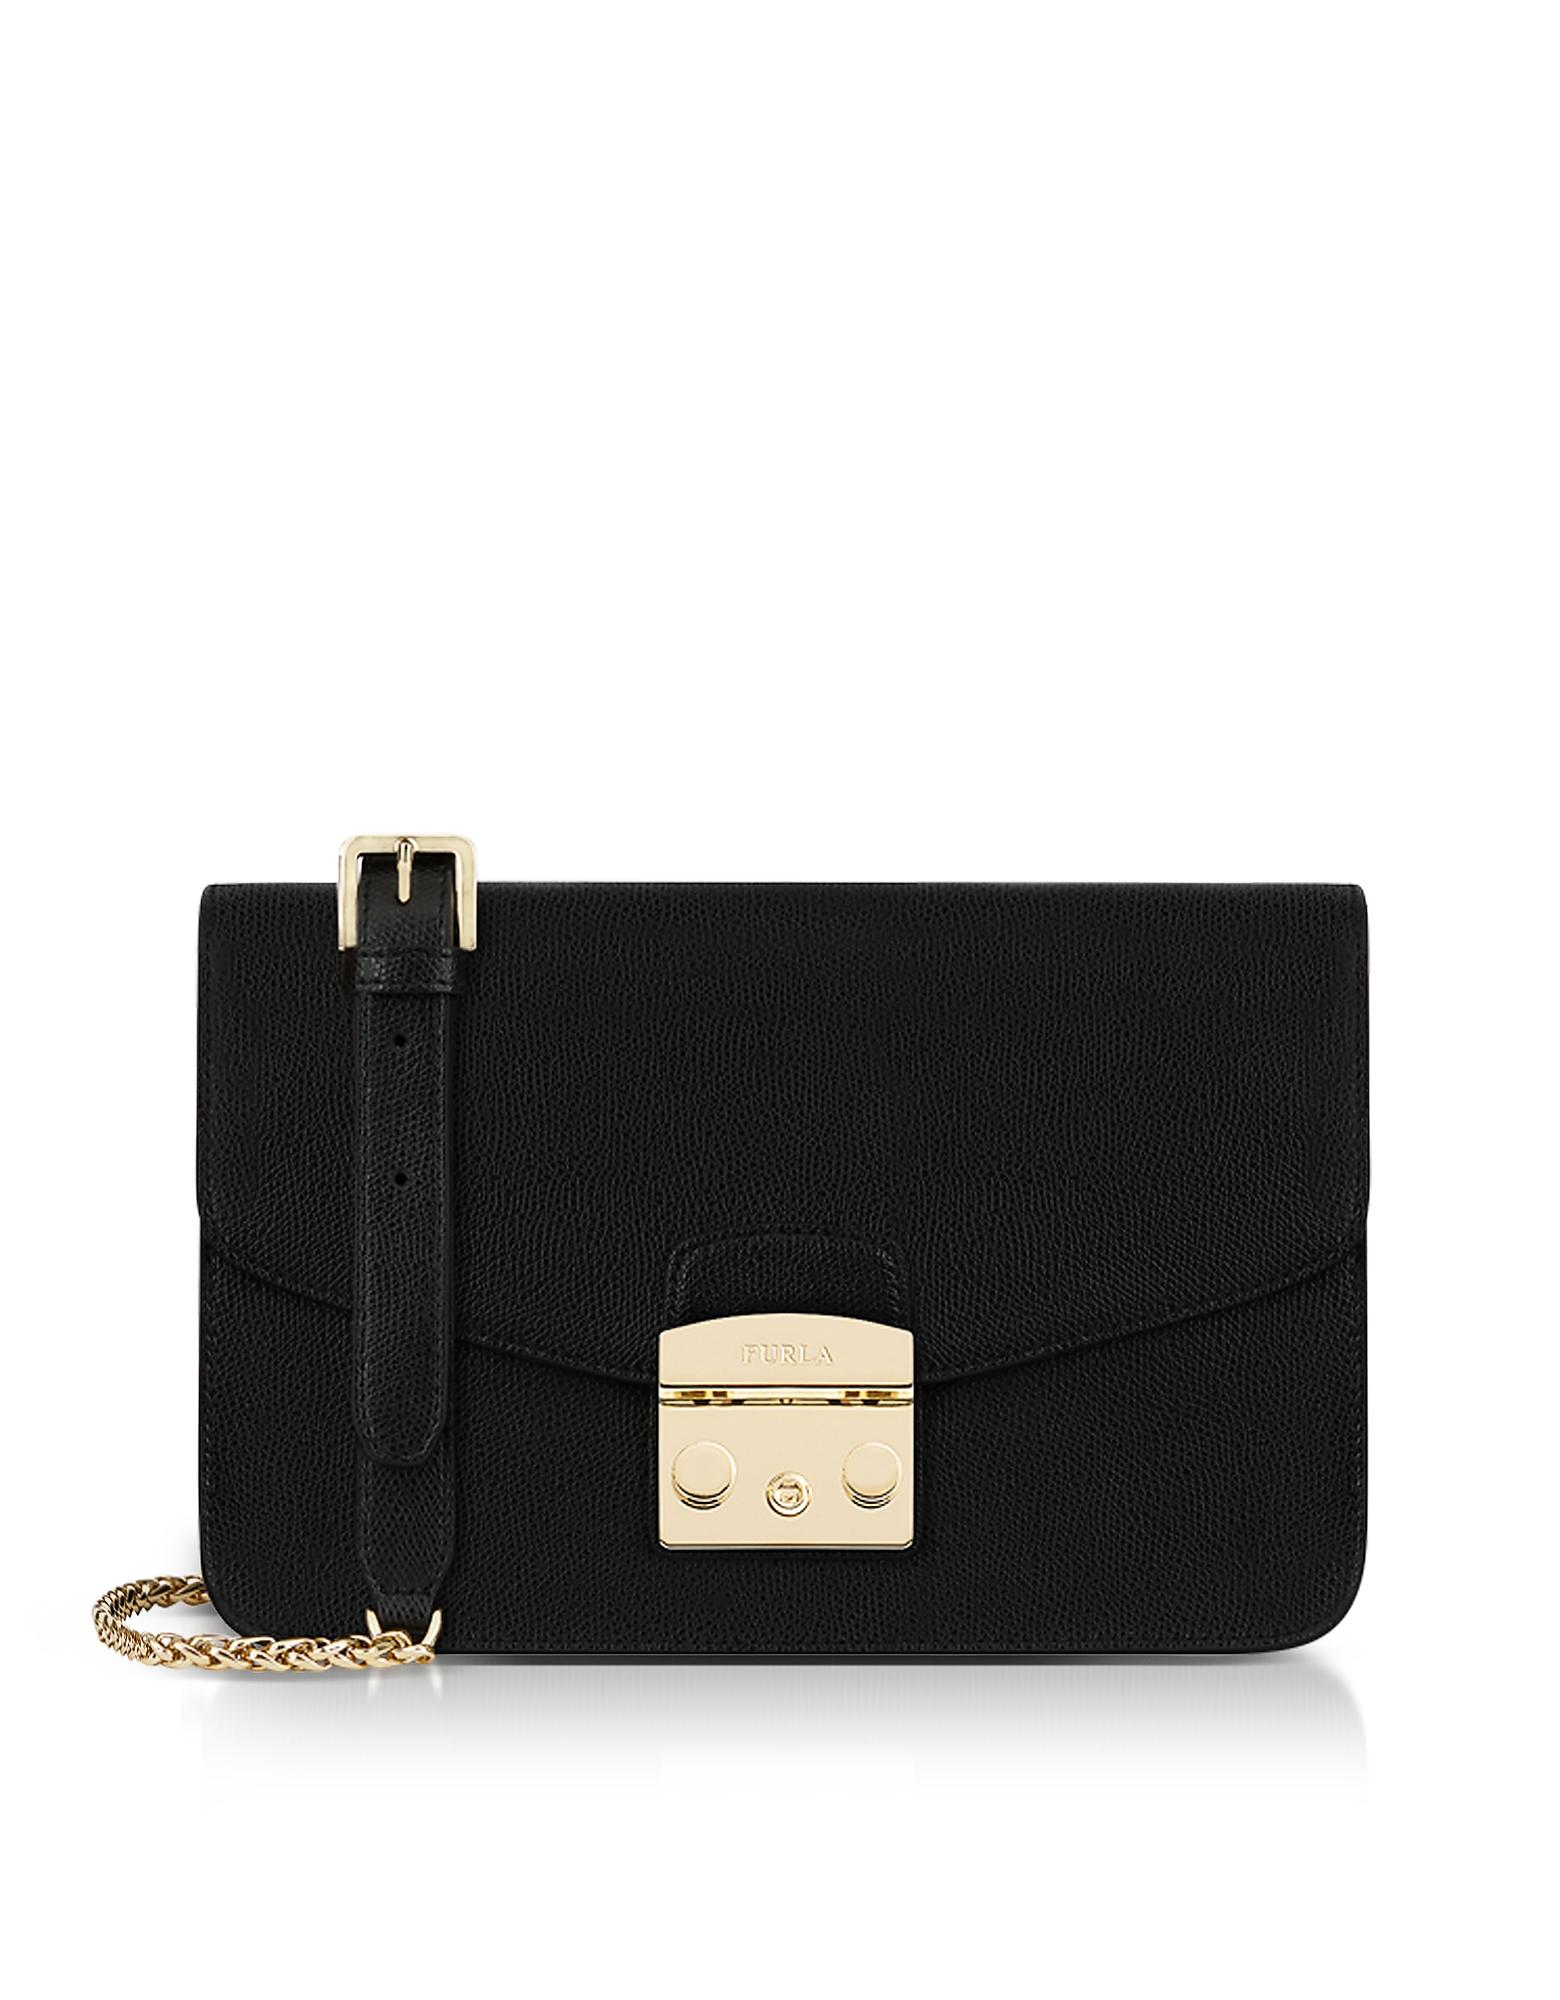 Image of Furla Designer Handbags, Onyx Lizard Printed Leather Metropolis Small Shoulder Bag